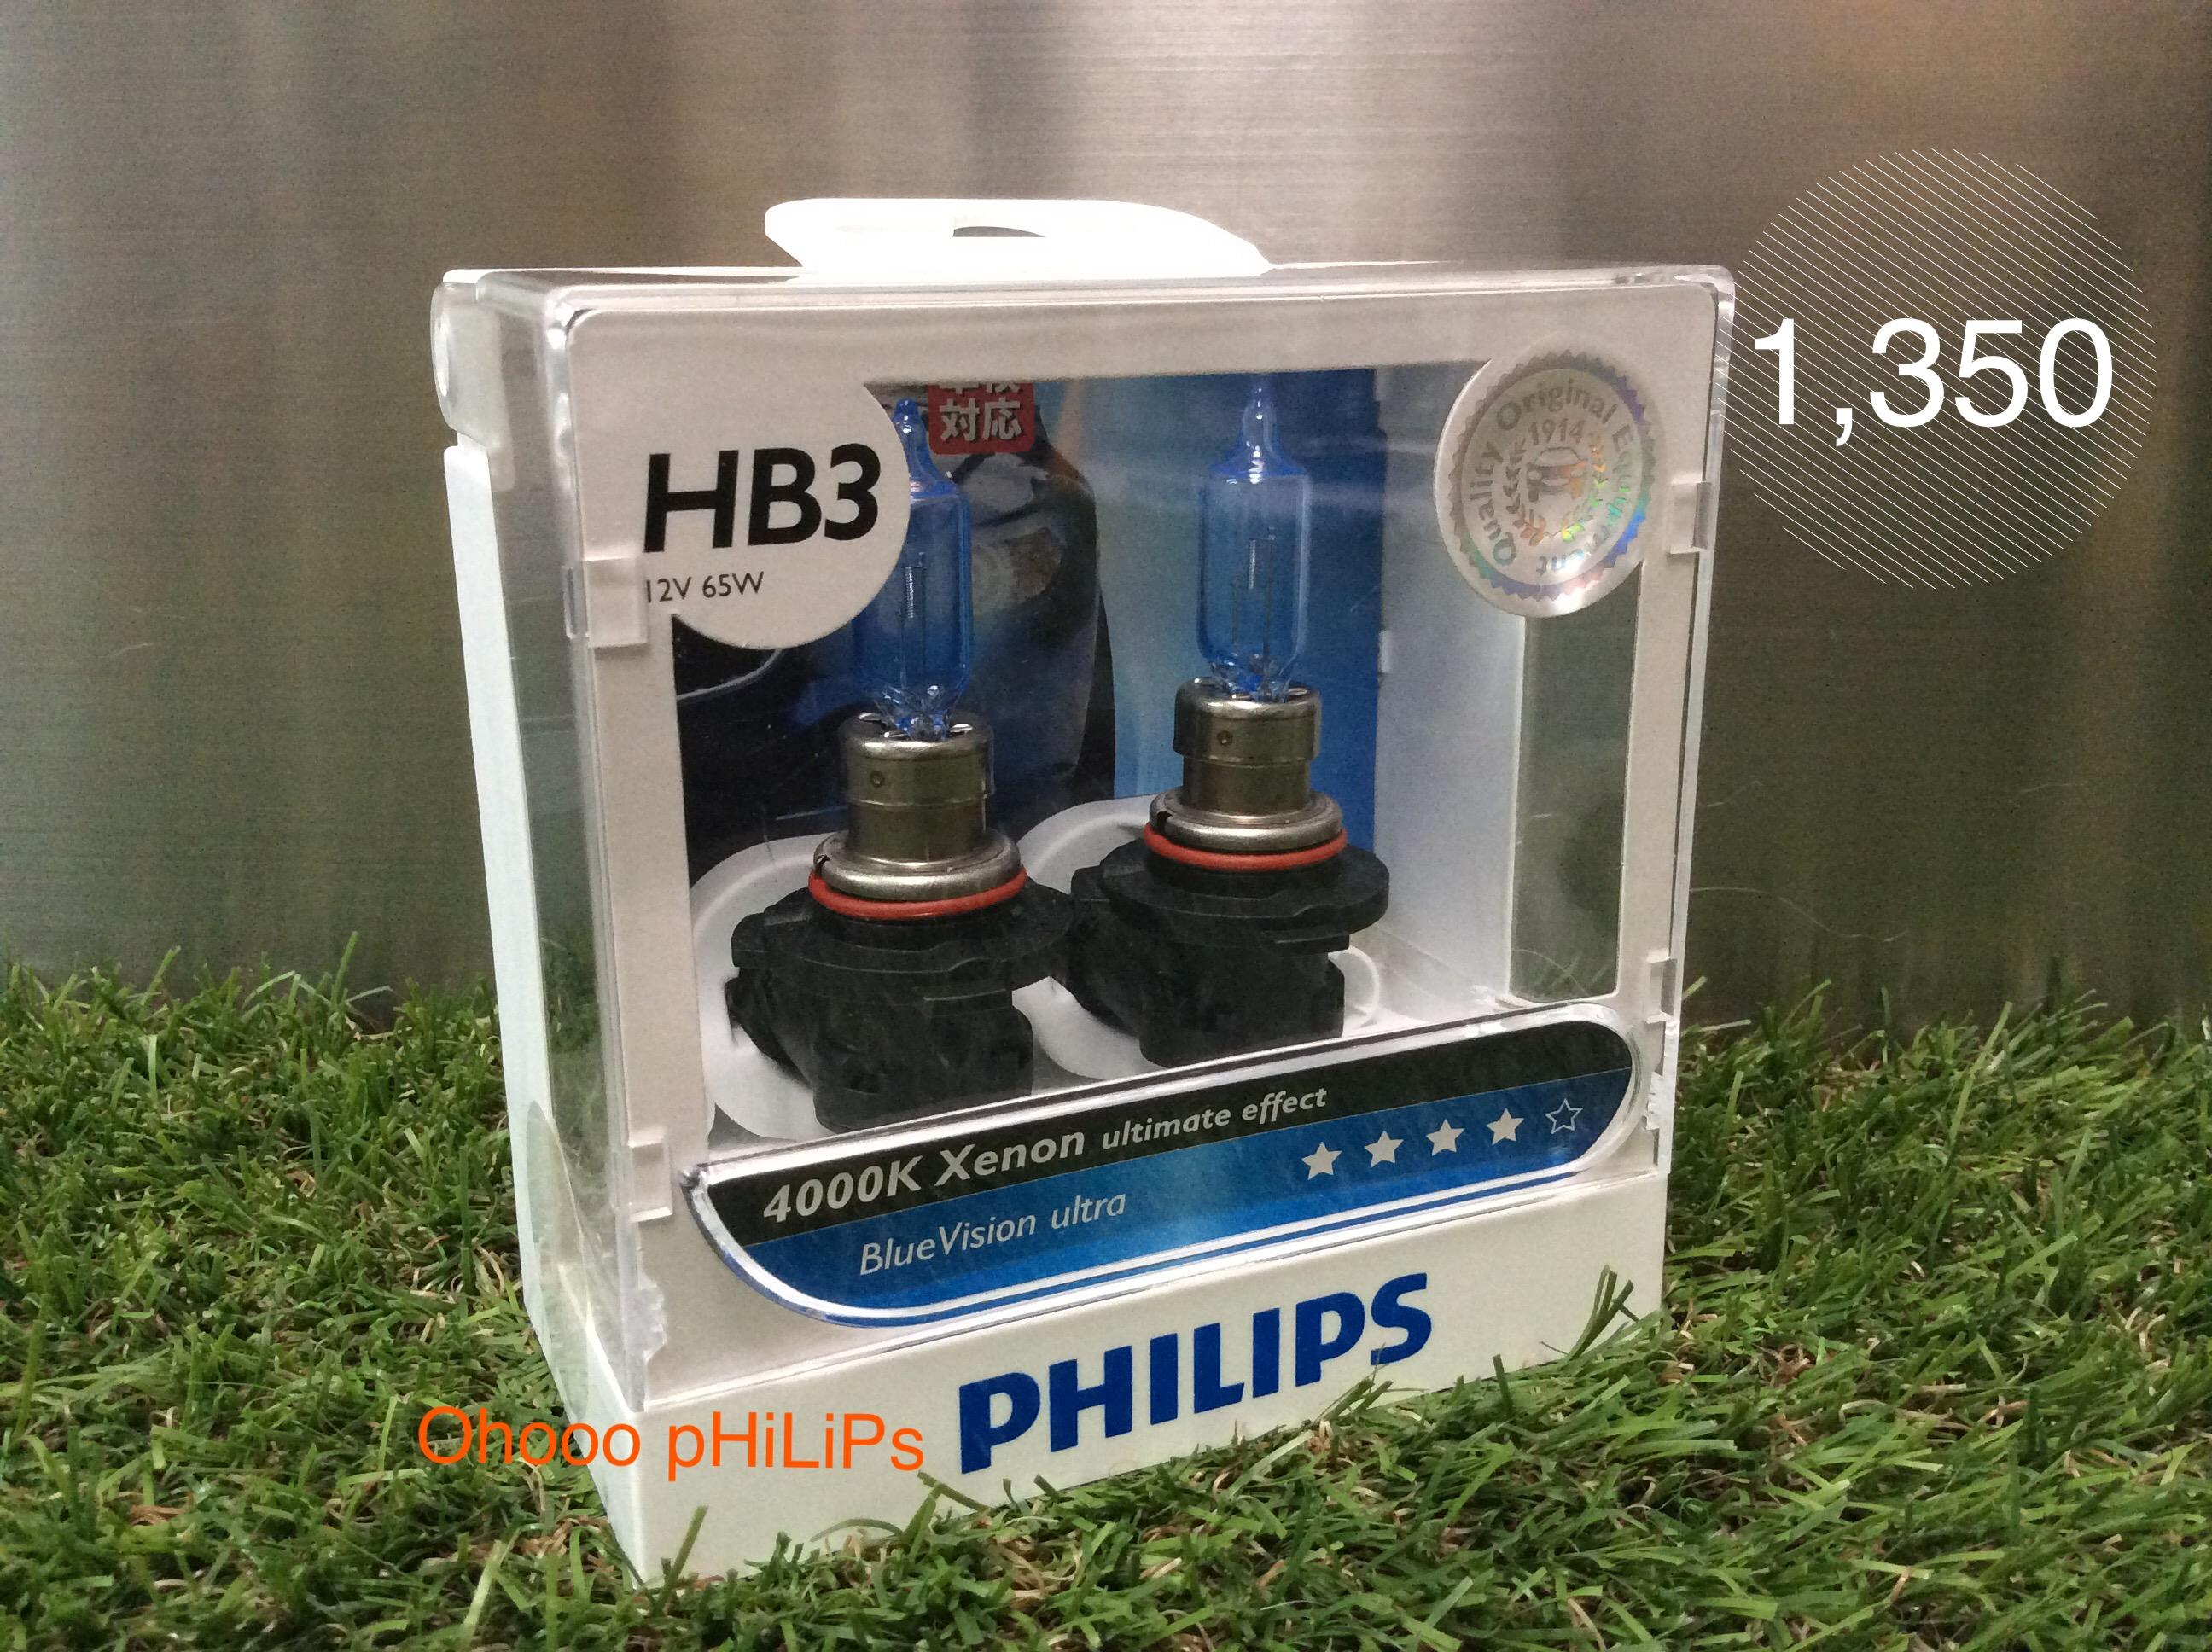 Philips Blue Vision 4000K HB3